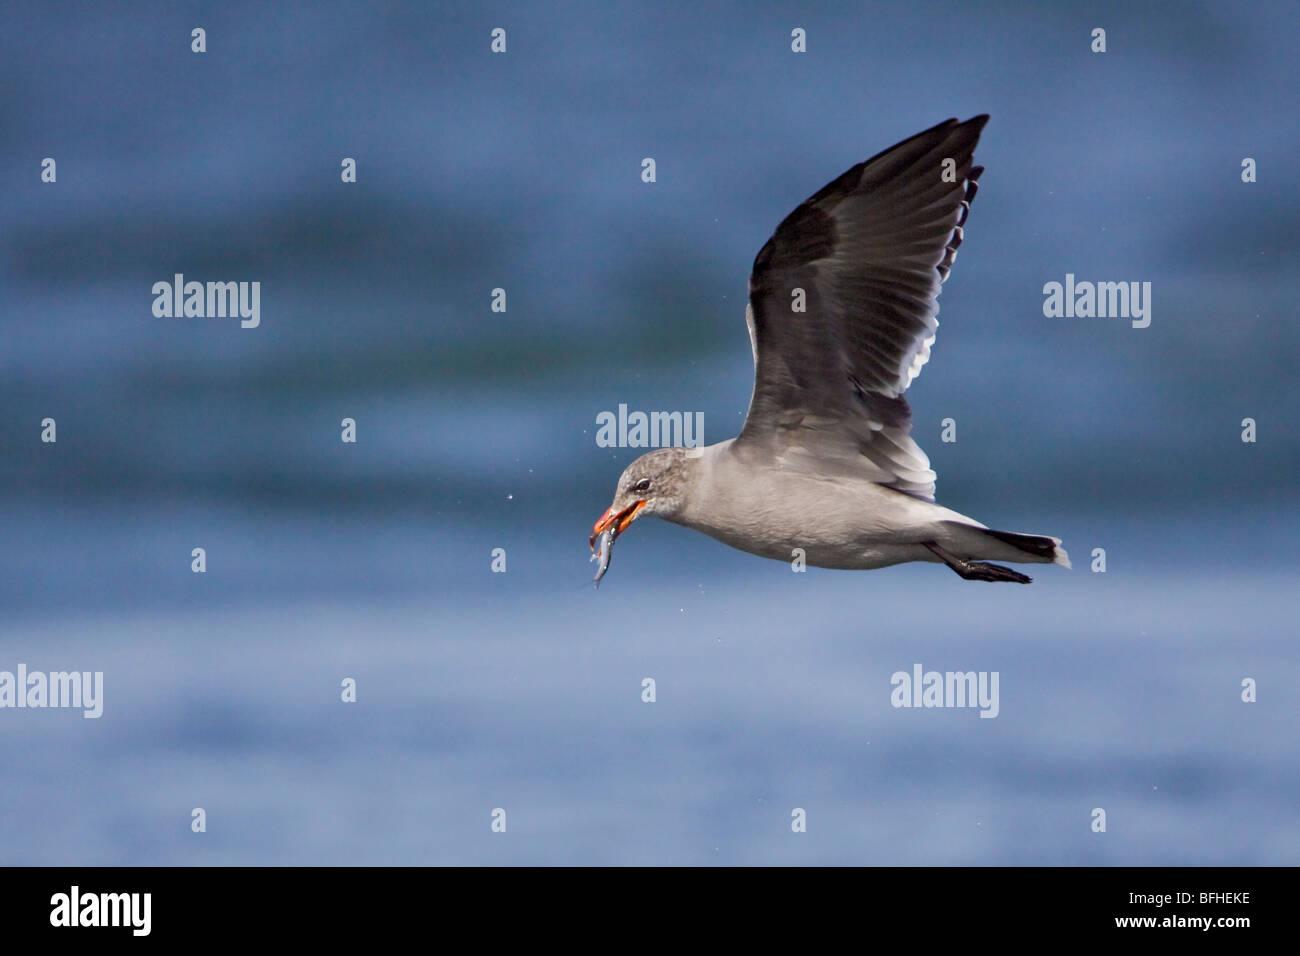 Heermann's Gull (Larus heermanni) flying in Washington, USA. - Stock Image